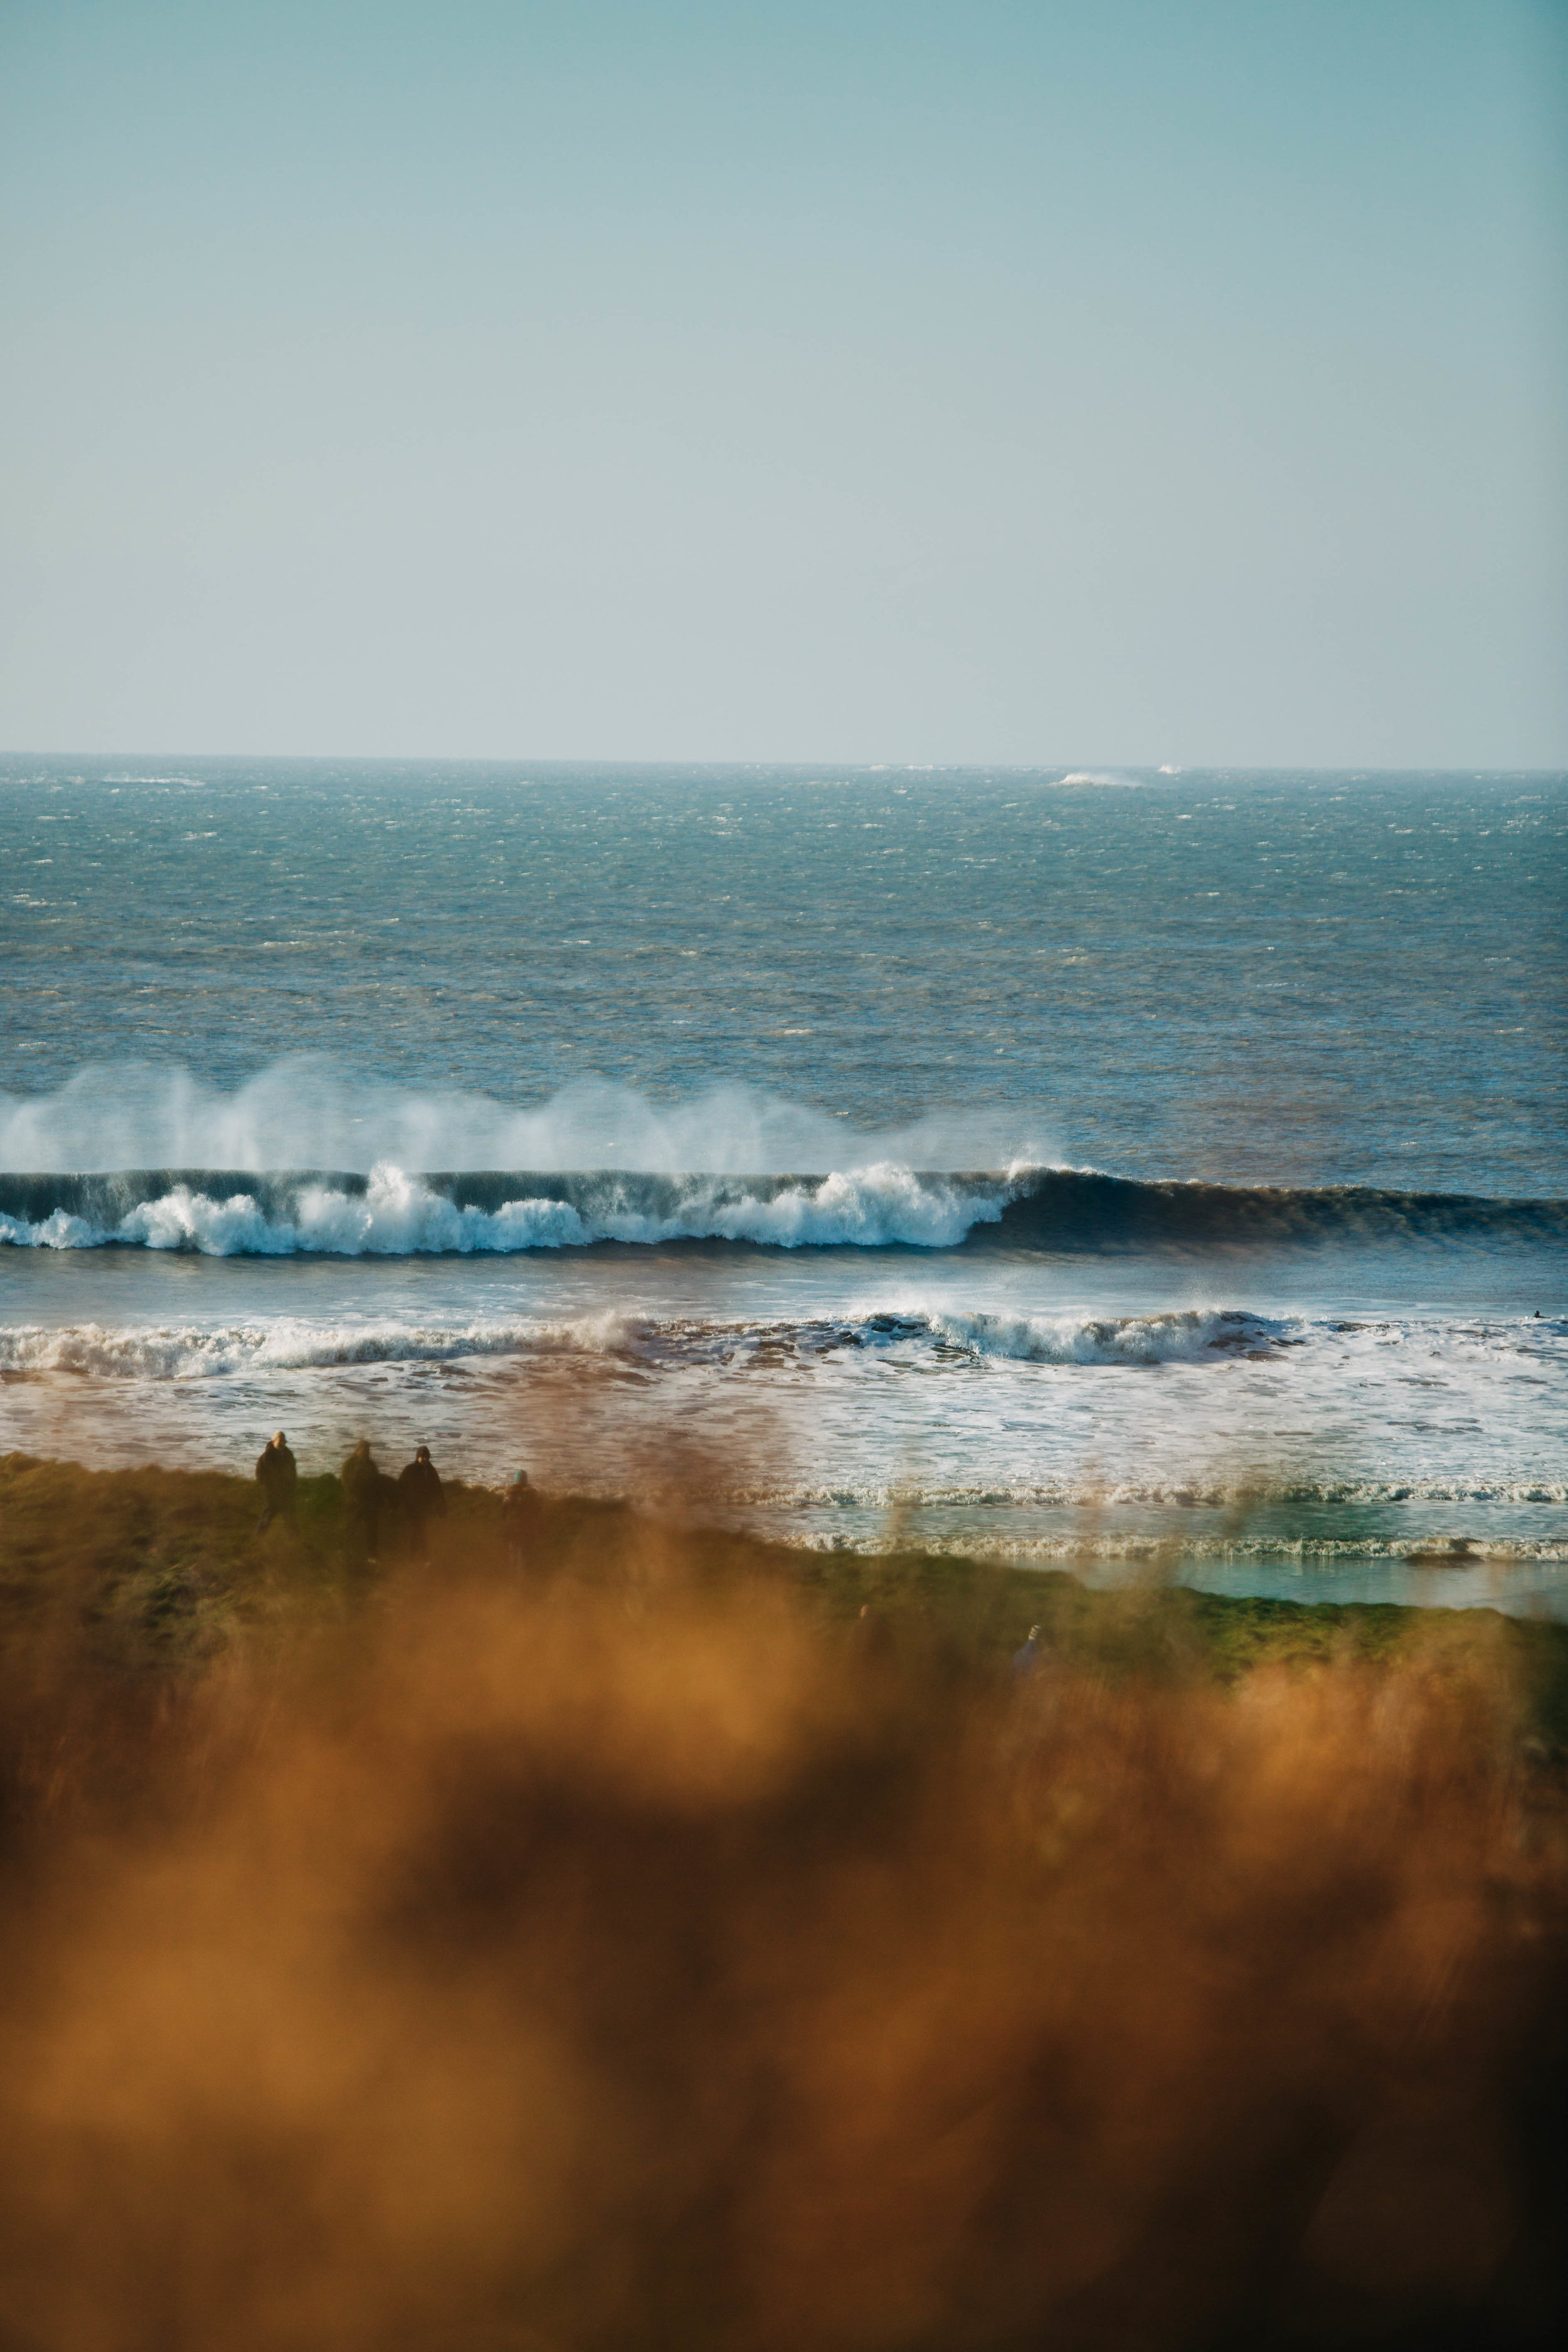 Alex_Sedgmond_Photography-Cardiff-SouthWales-PorthcawlRestbay-Surfing-EzraHames-62.jpg